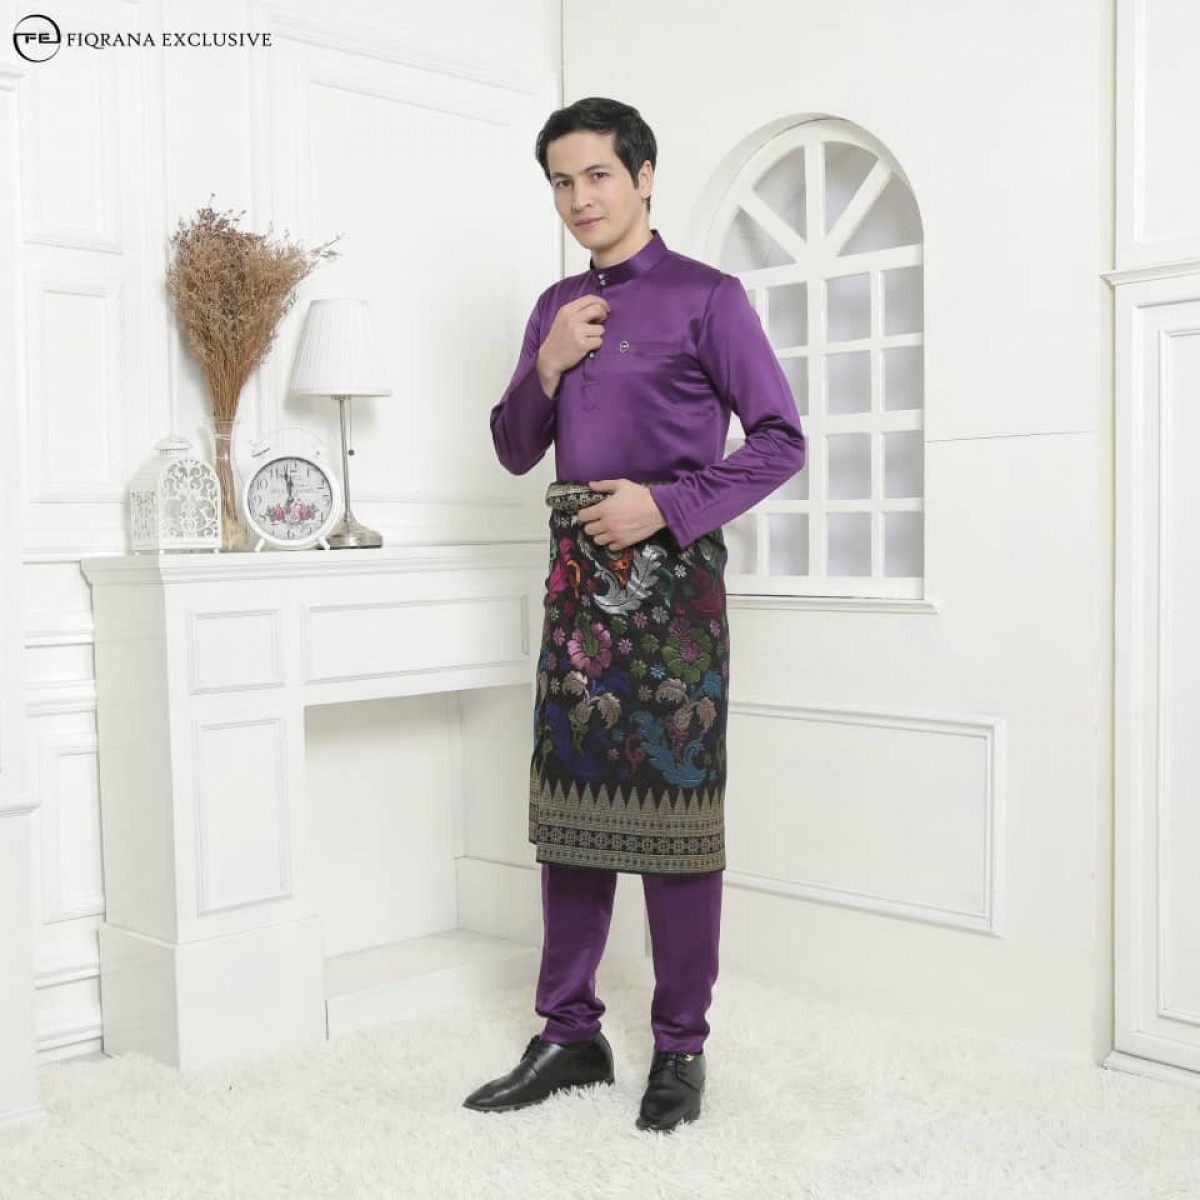 Baju Melayu Slimfit Violet Purple - Fiqrana Exclusive